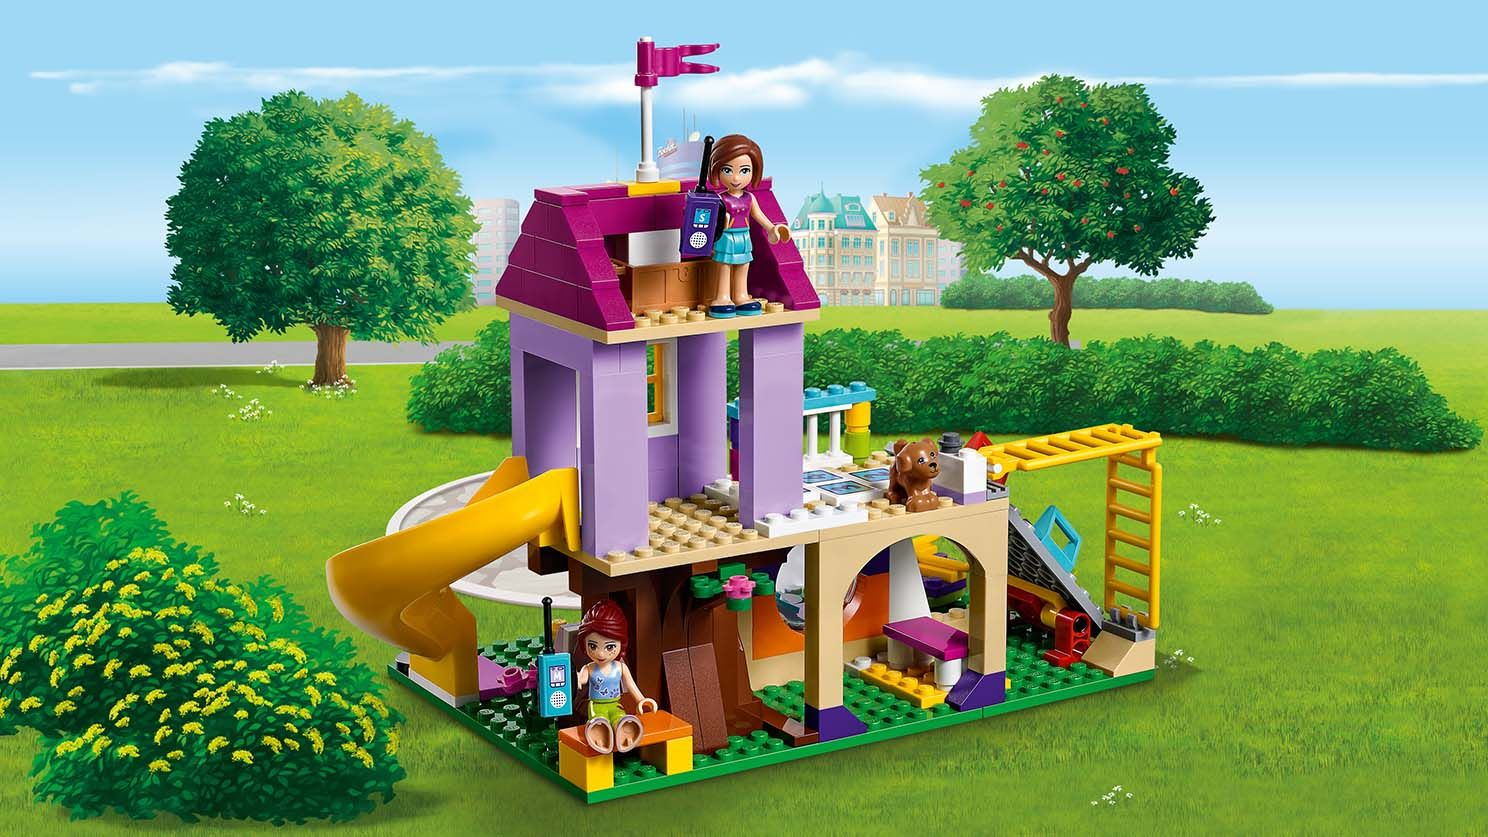 41325 Heartlake City speeltuin Producten LEGO